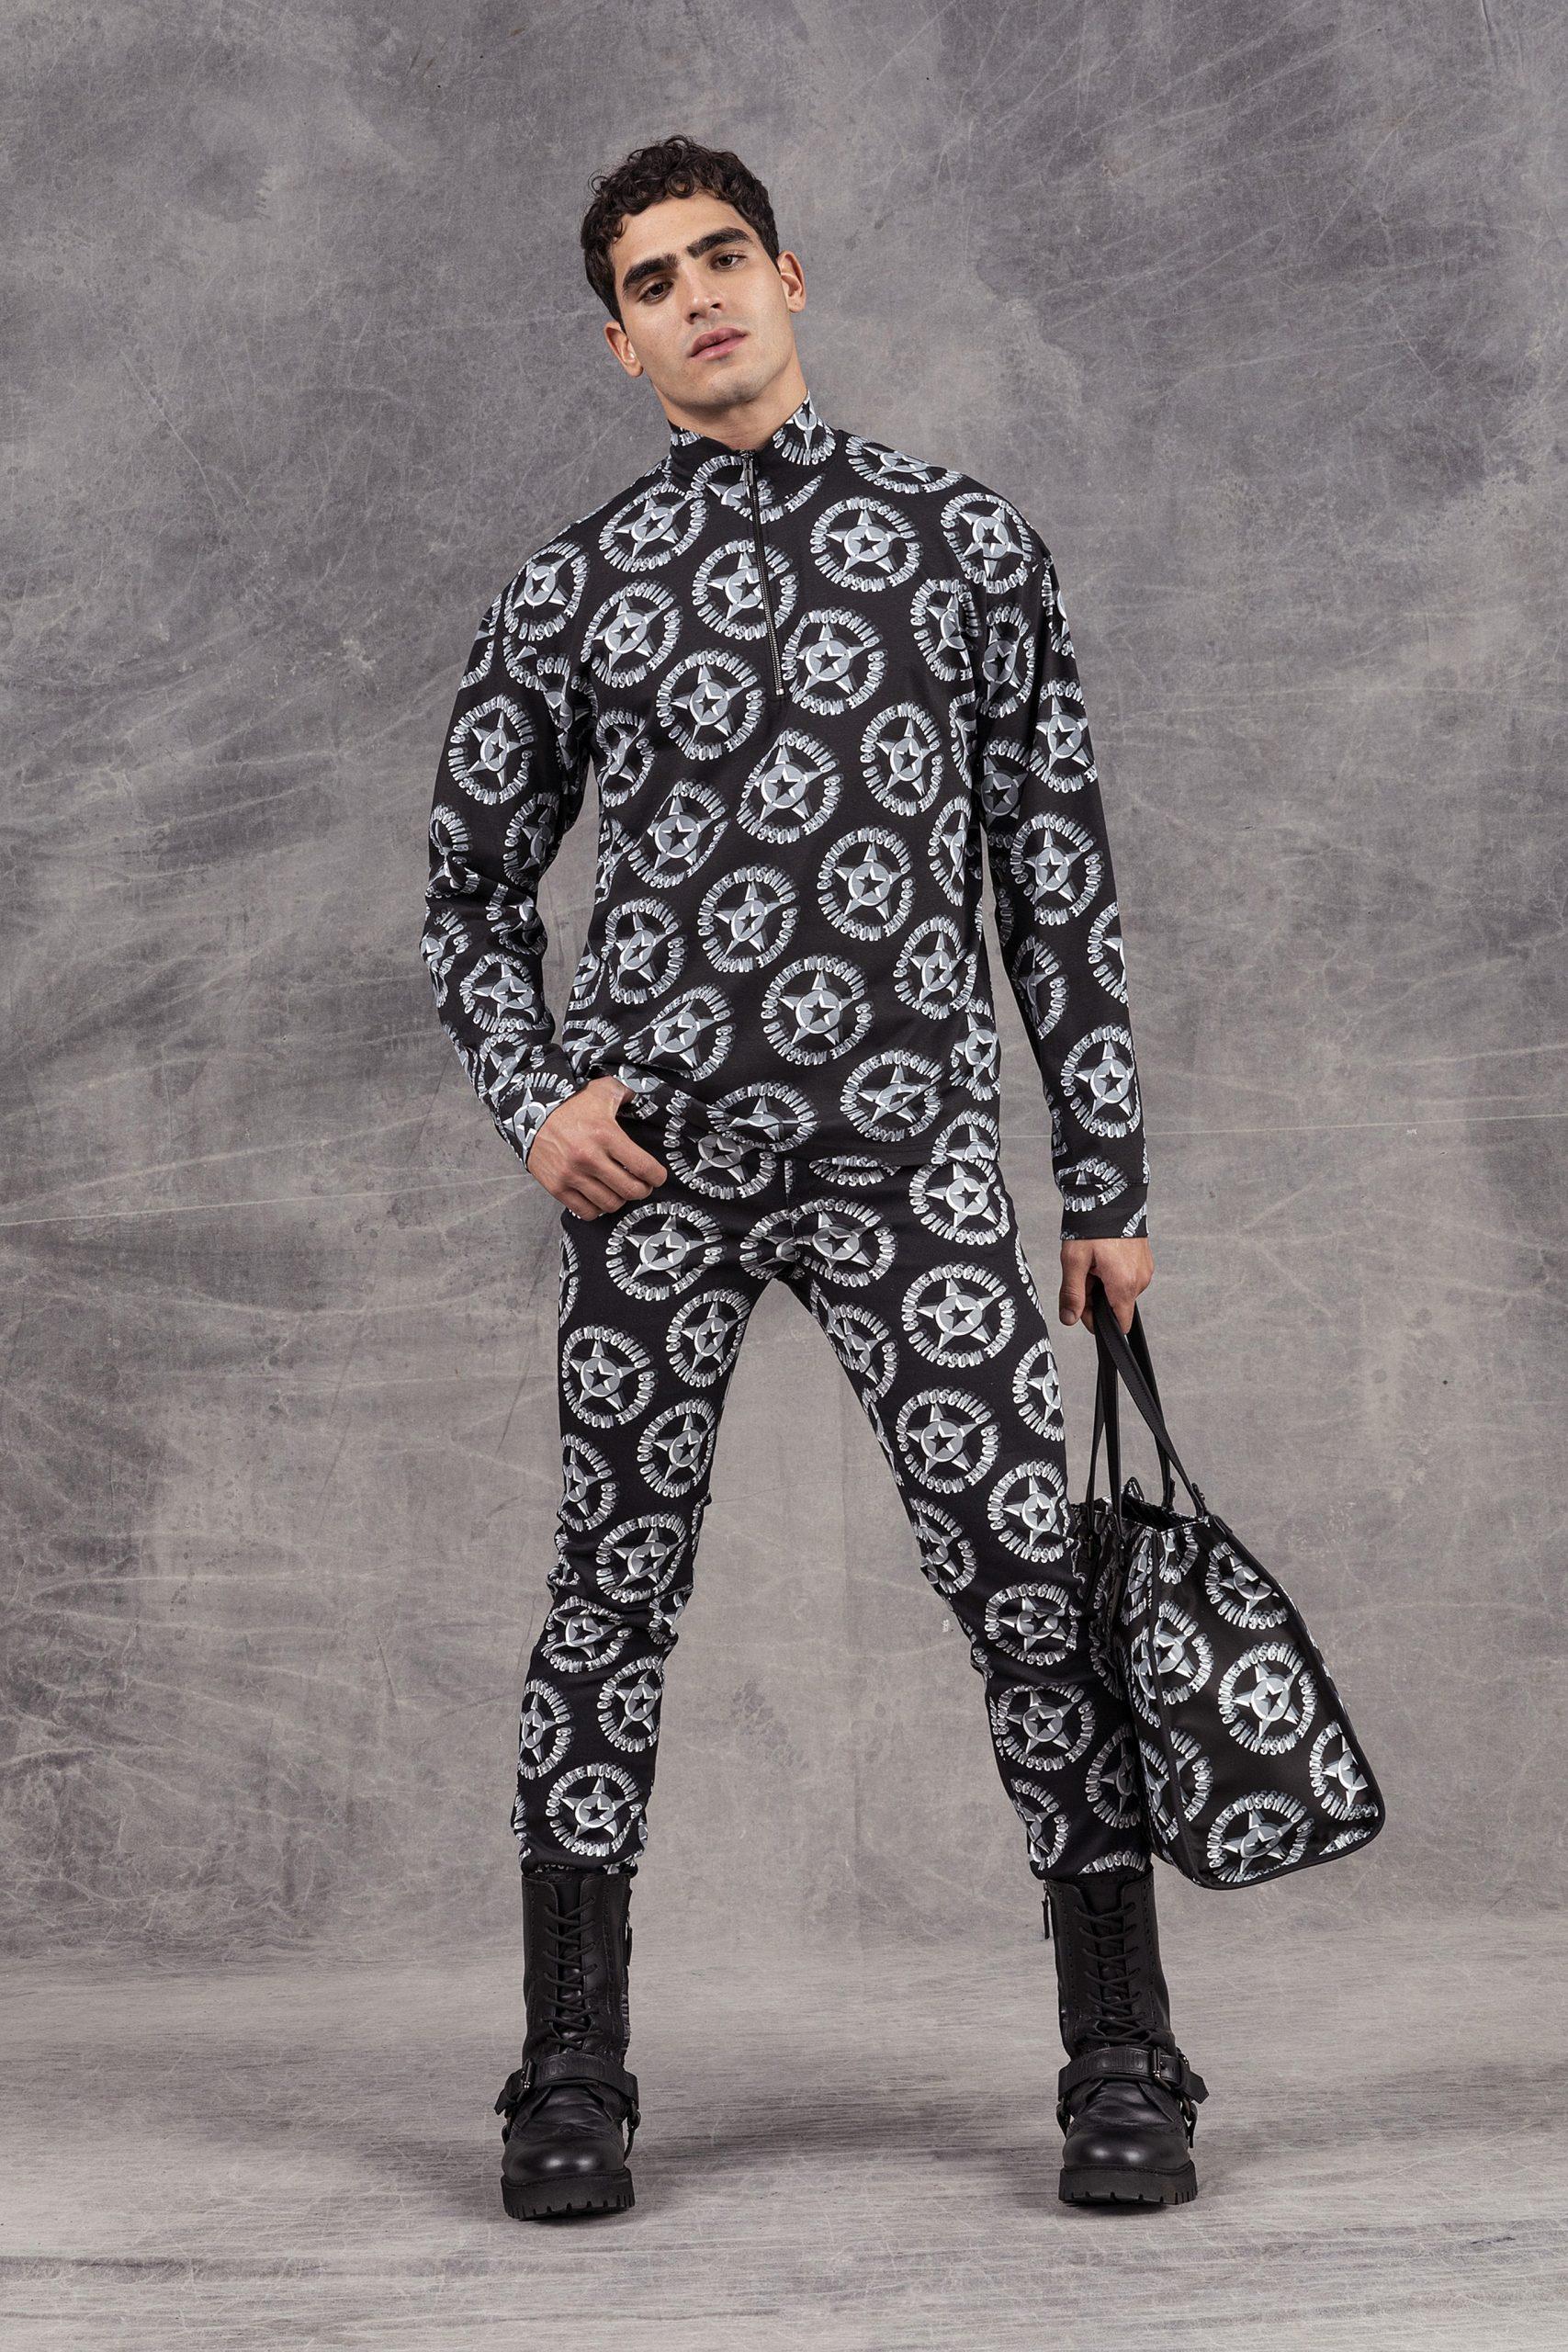 Moschino Pre-Fall 2021 Men's Fashion Show Photos